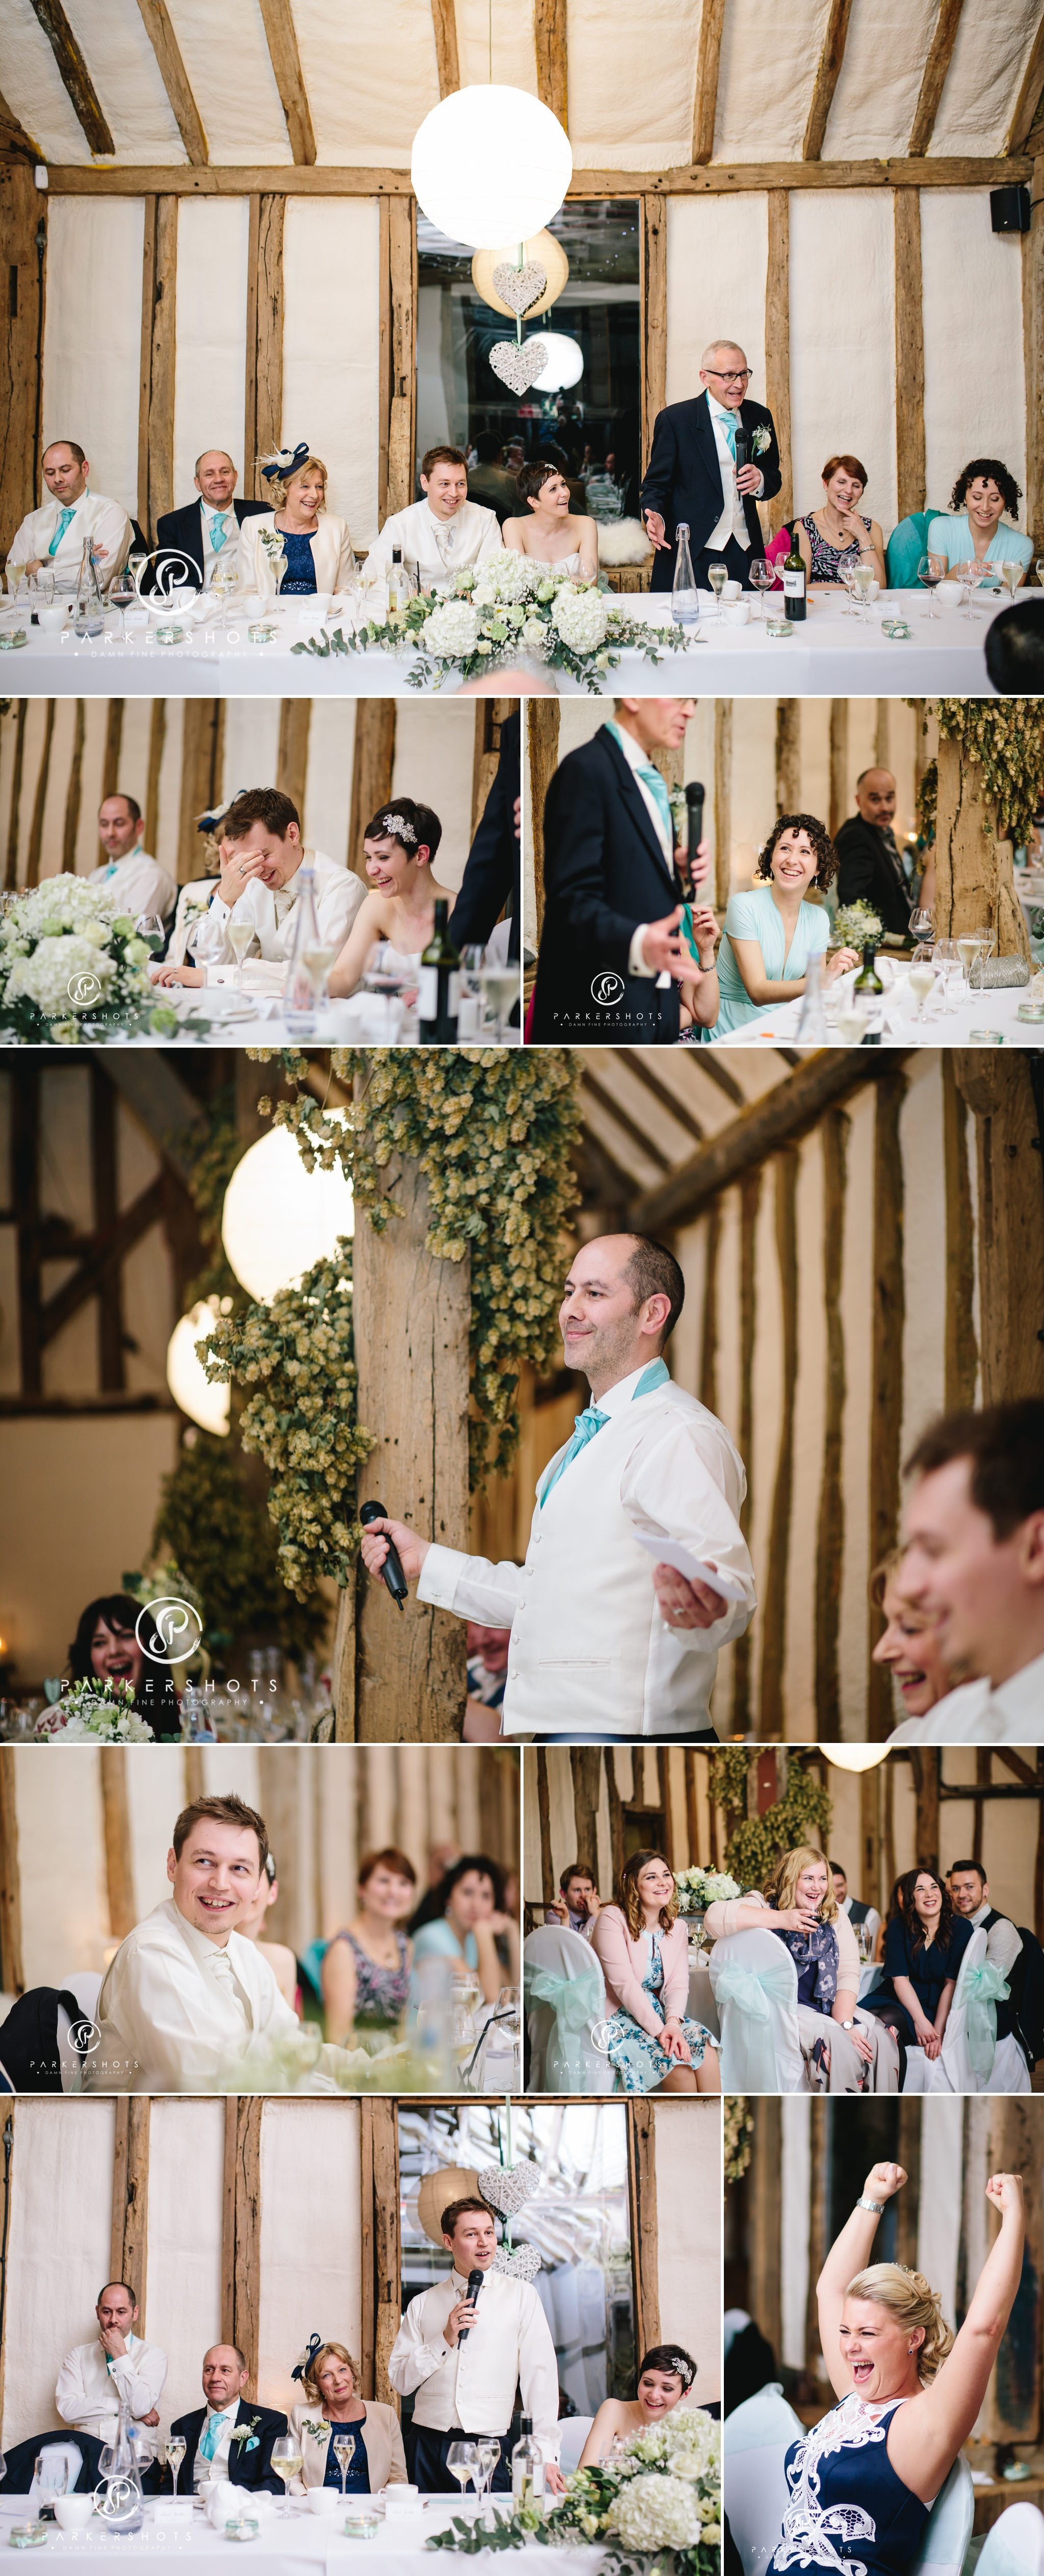 Wedding speeches at Winters Barns